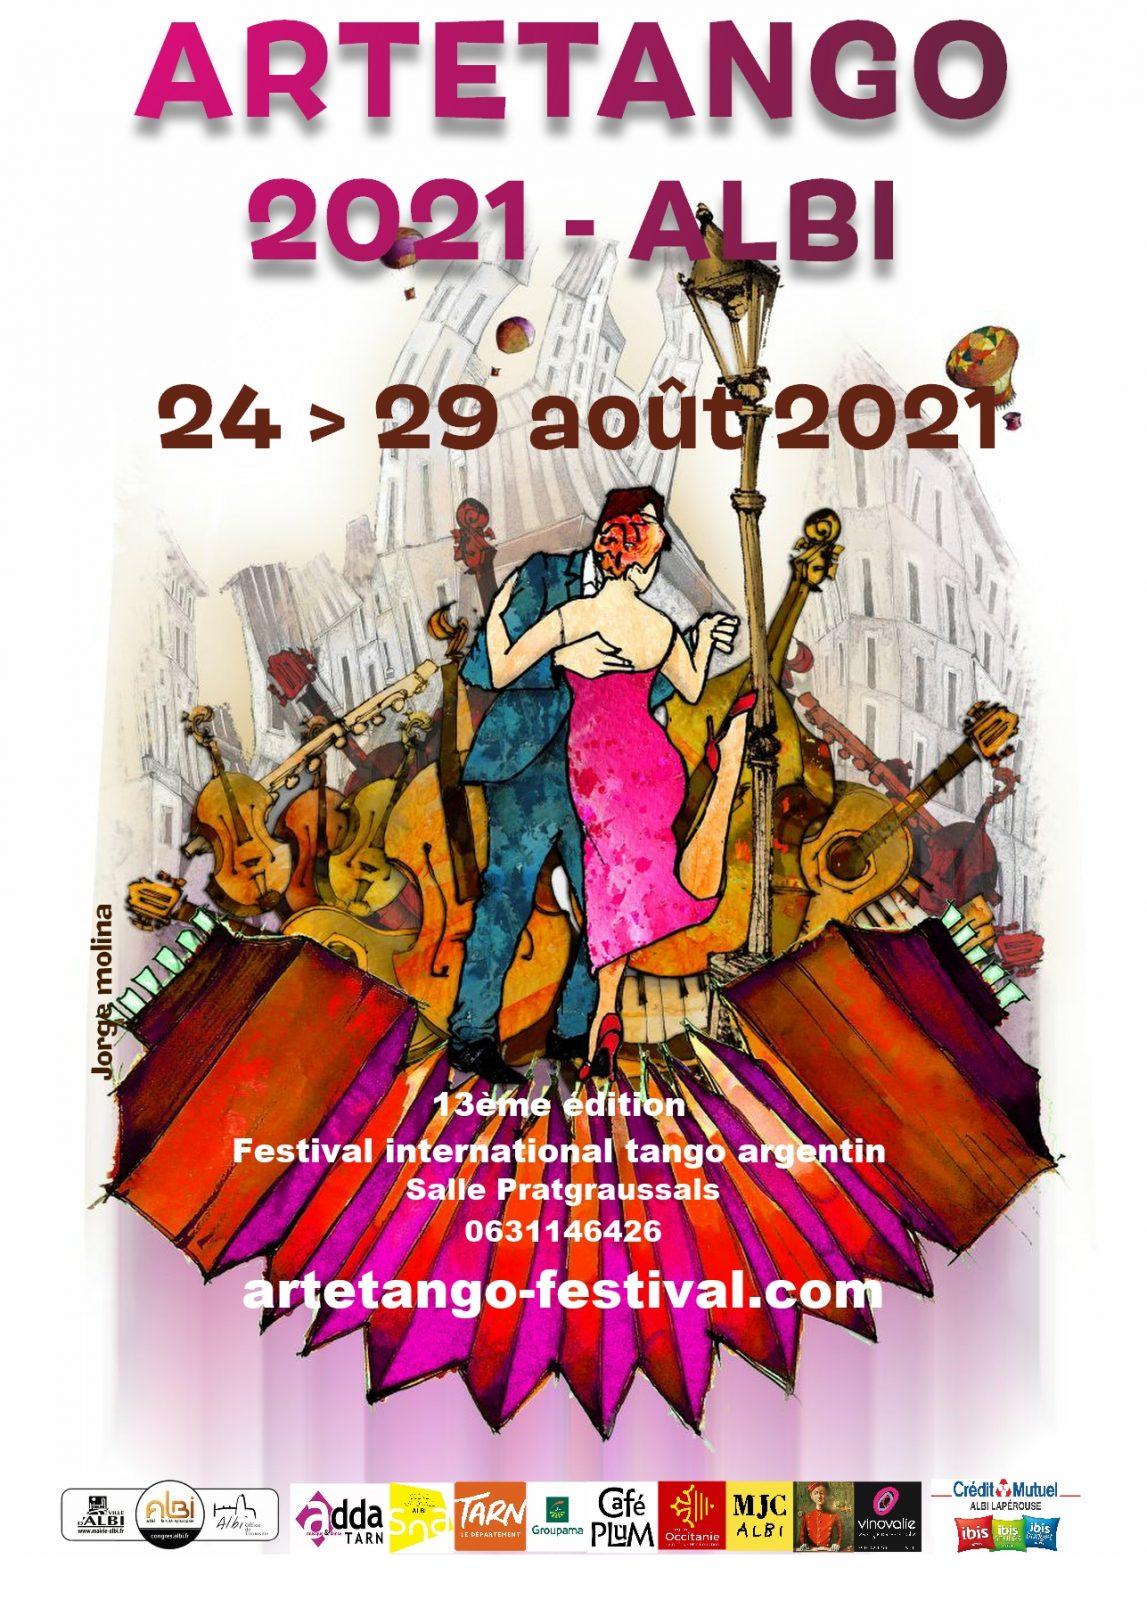 festival artetango albi 2021